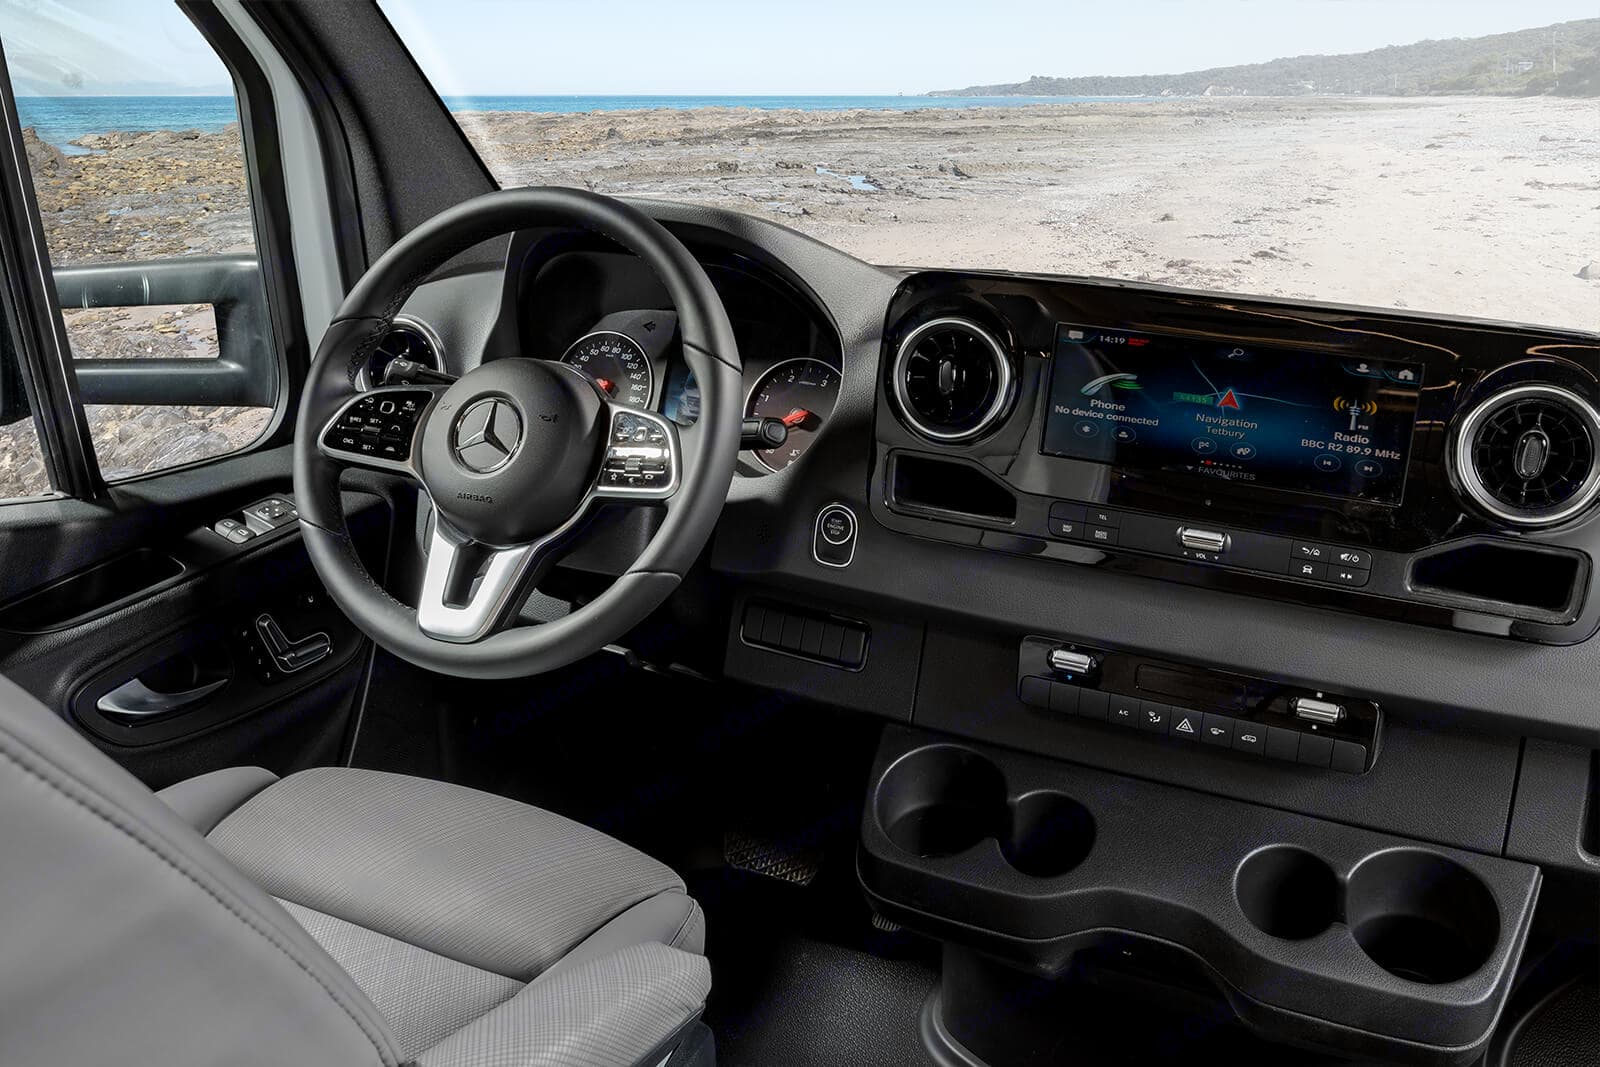 Mercedes Sprinter Chassis Cab. Unity U24RL 2021